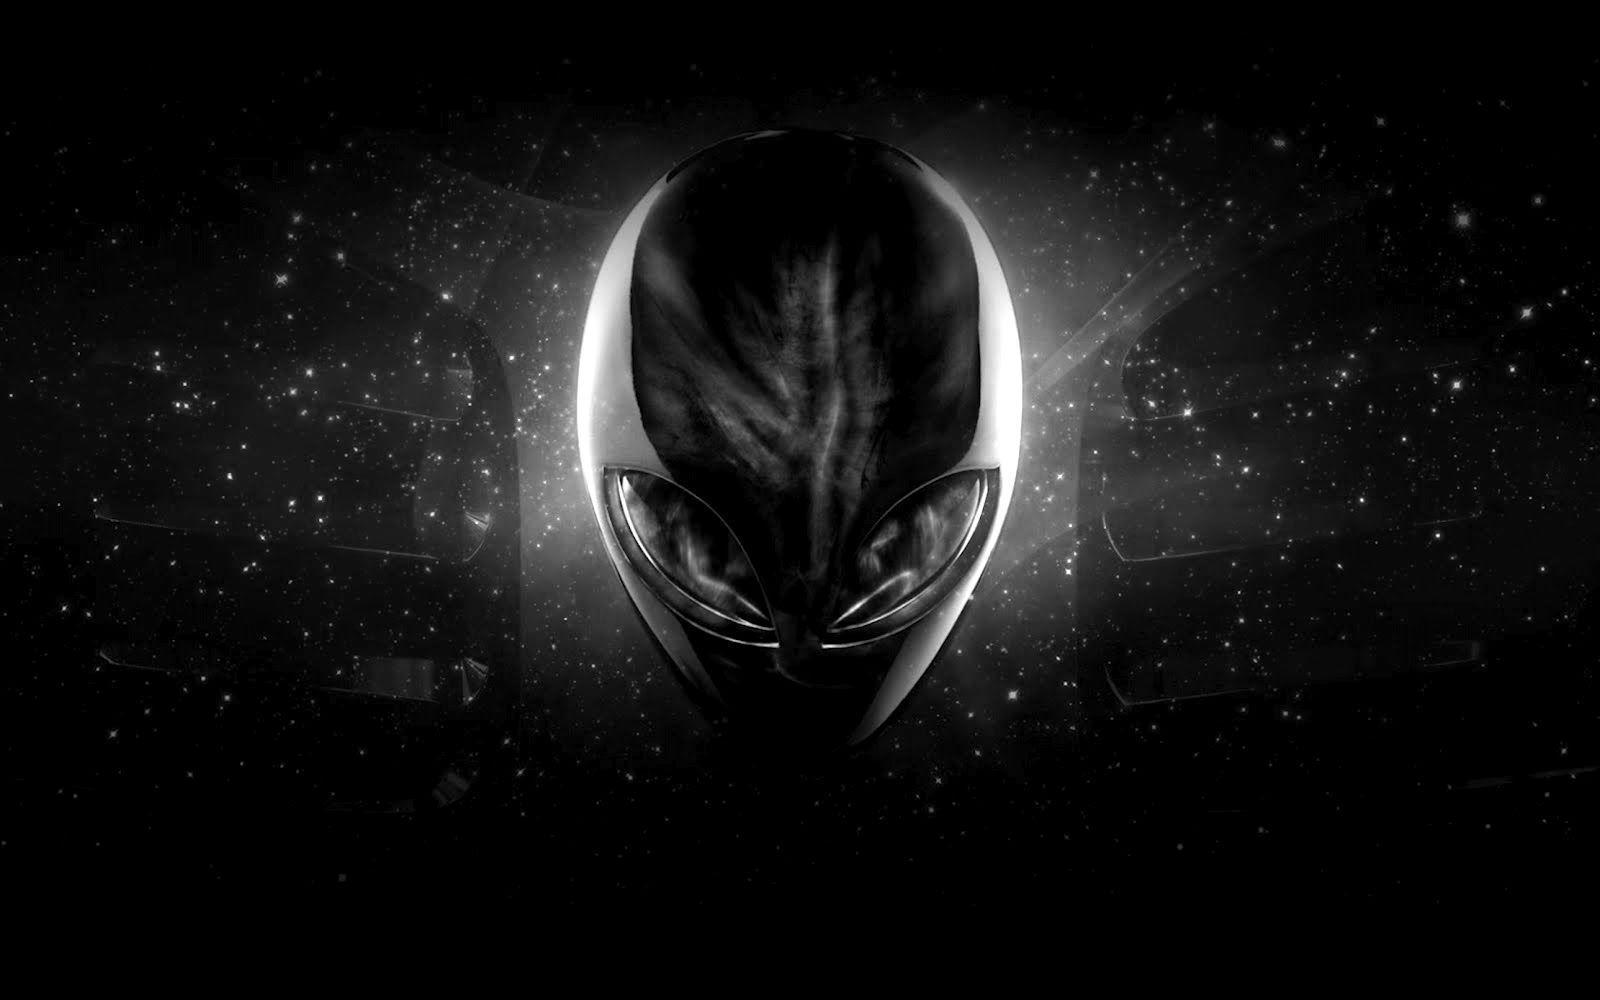 alien hd iphone wallpapers - photo #13